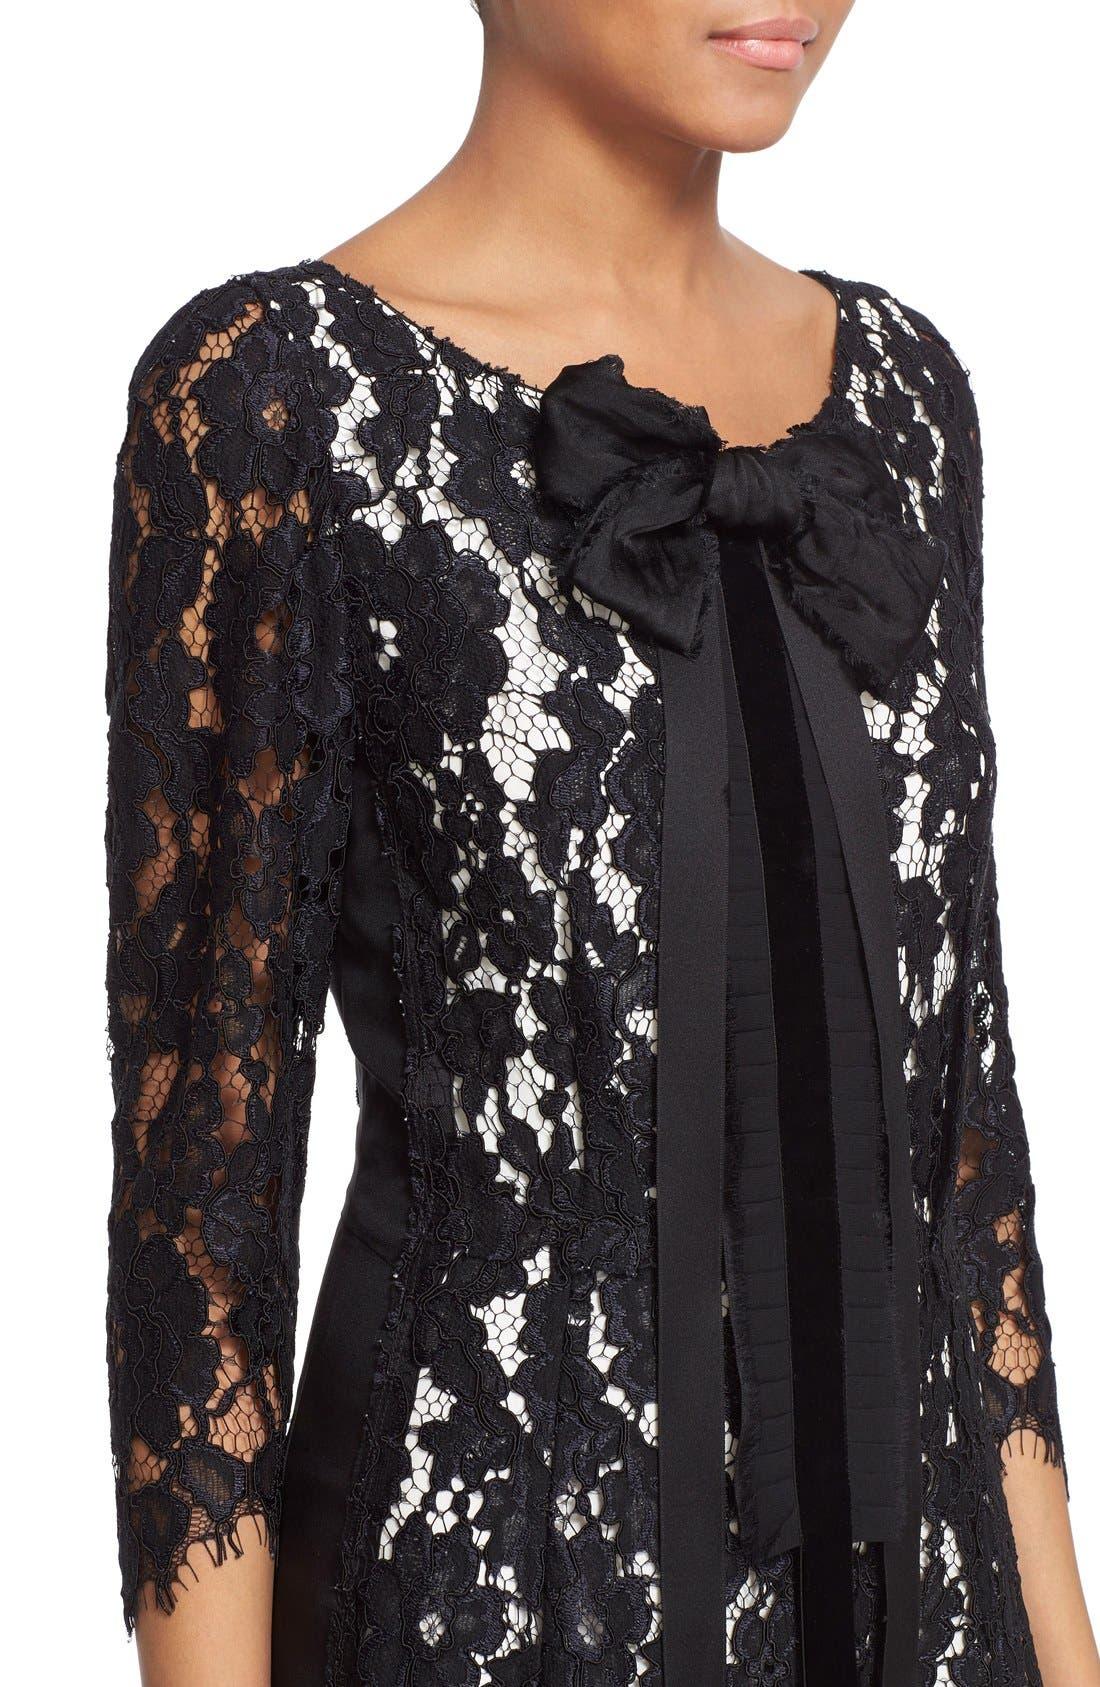 Bow Detail Lace Shift Dress,                             Alternate thumbnail 5, color,                             001